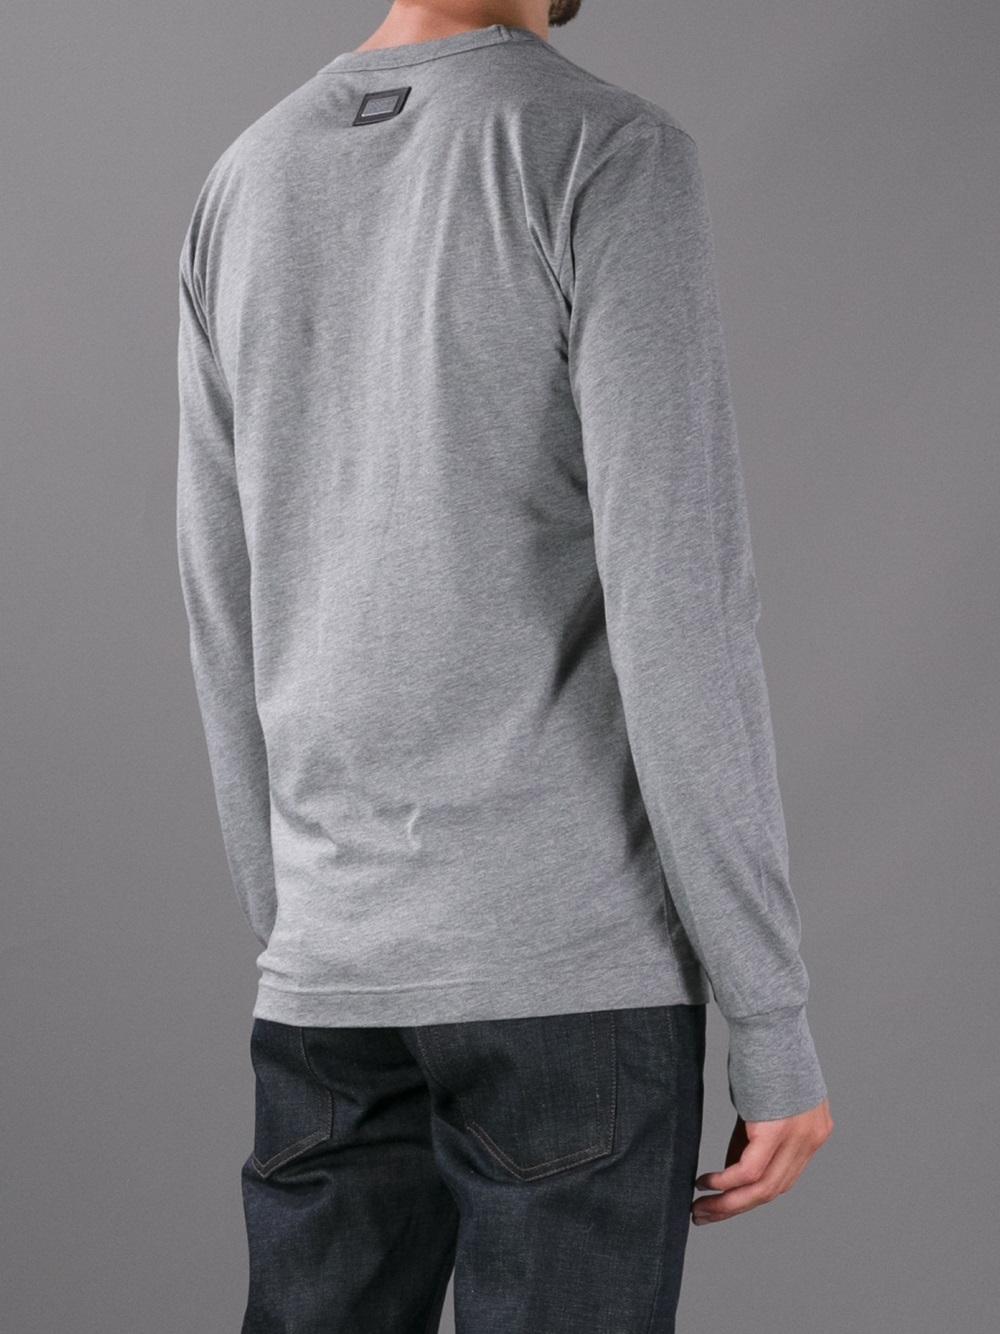 Dolce & Gabbana Long Sleeve Crew Neck Tshirt in Grey (Grey) for Men